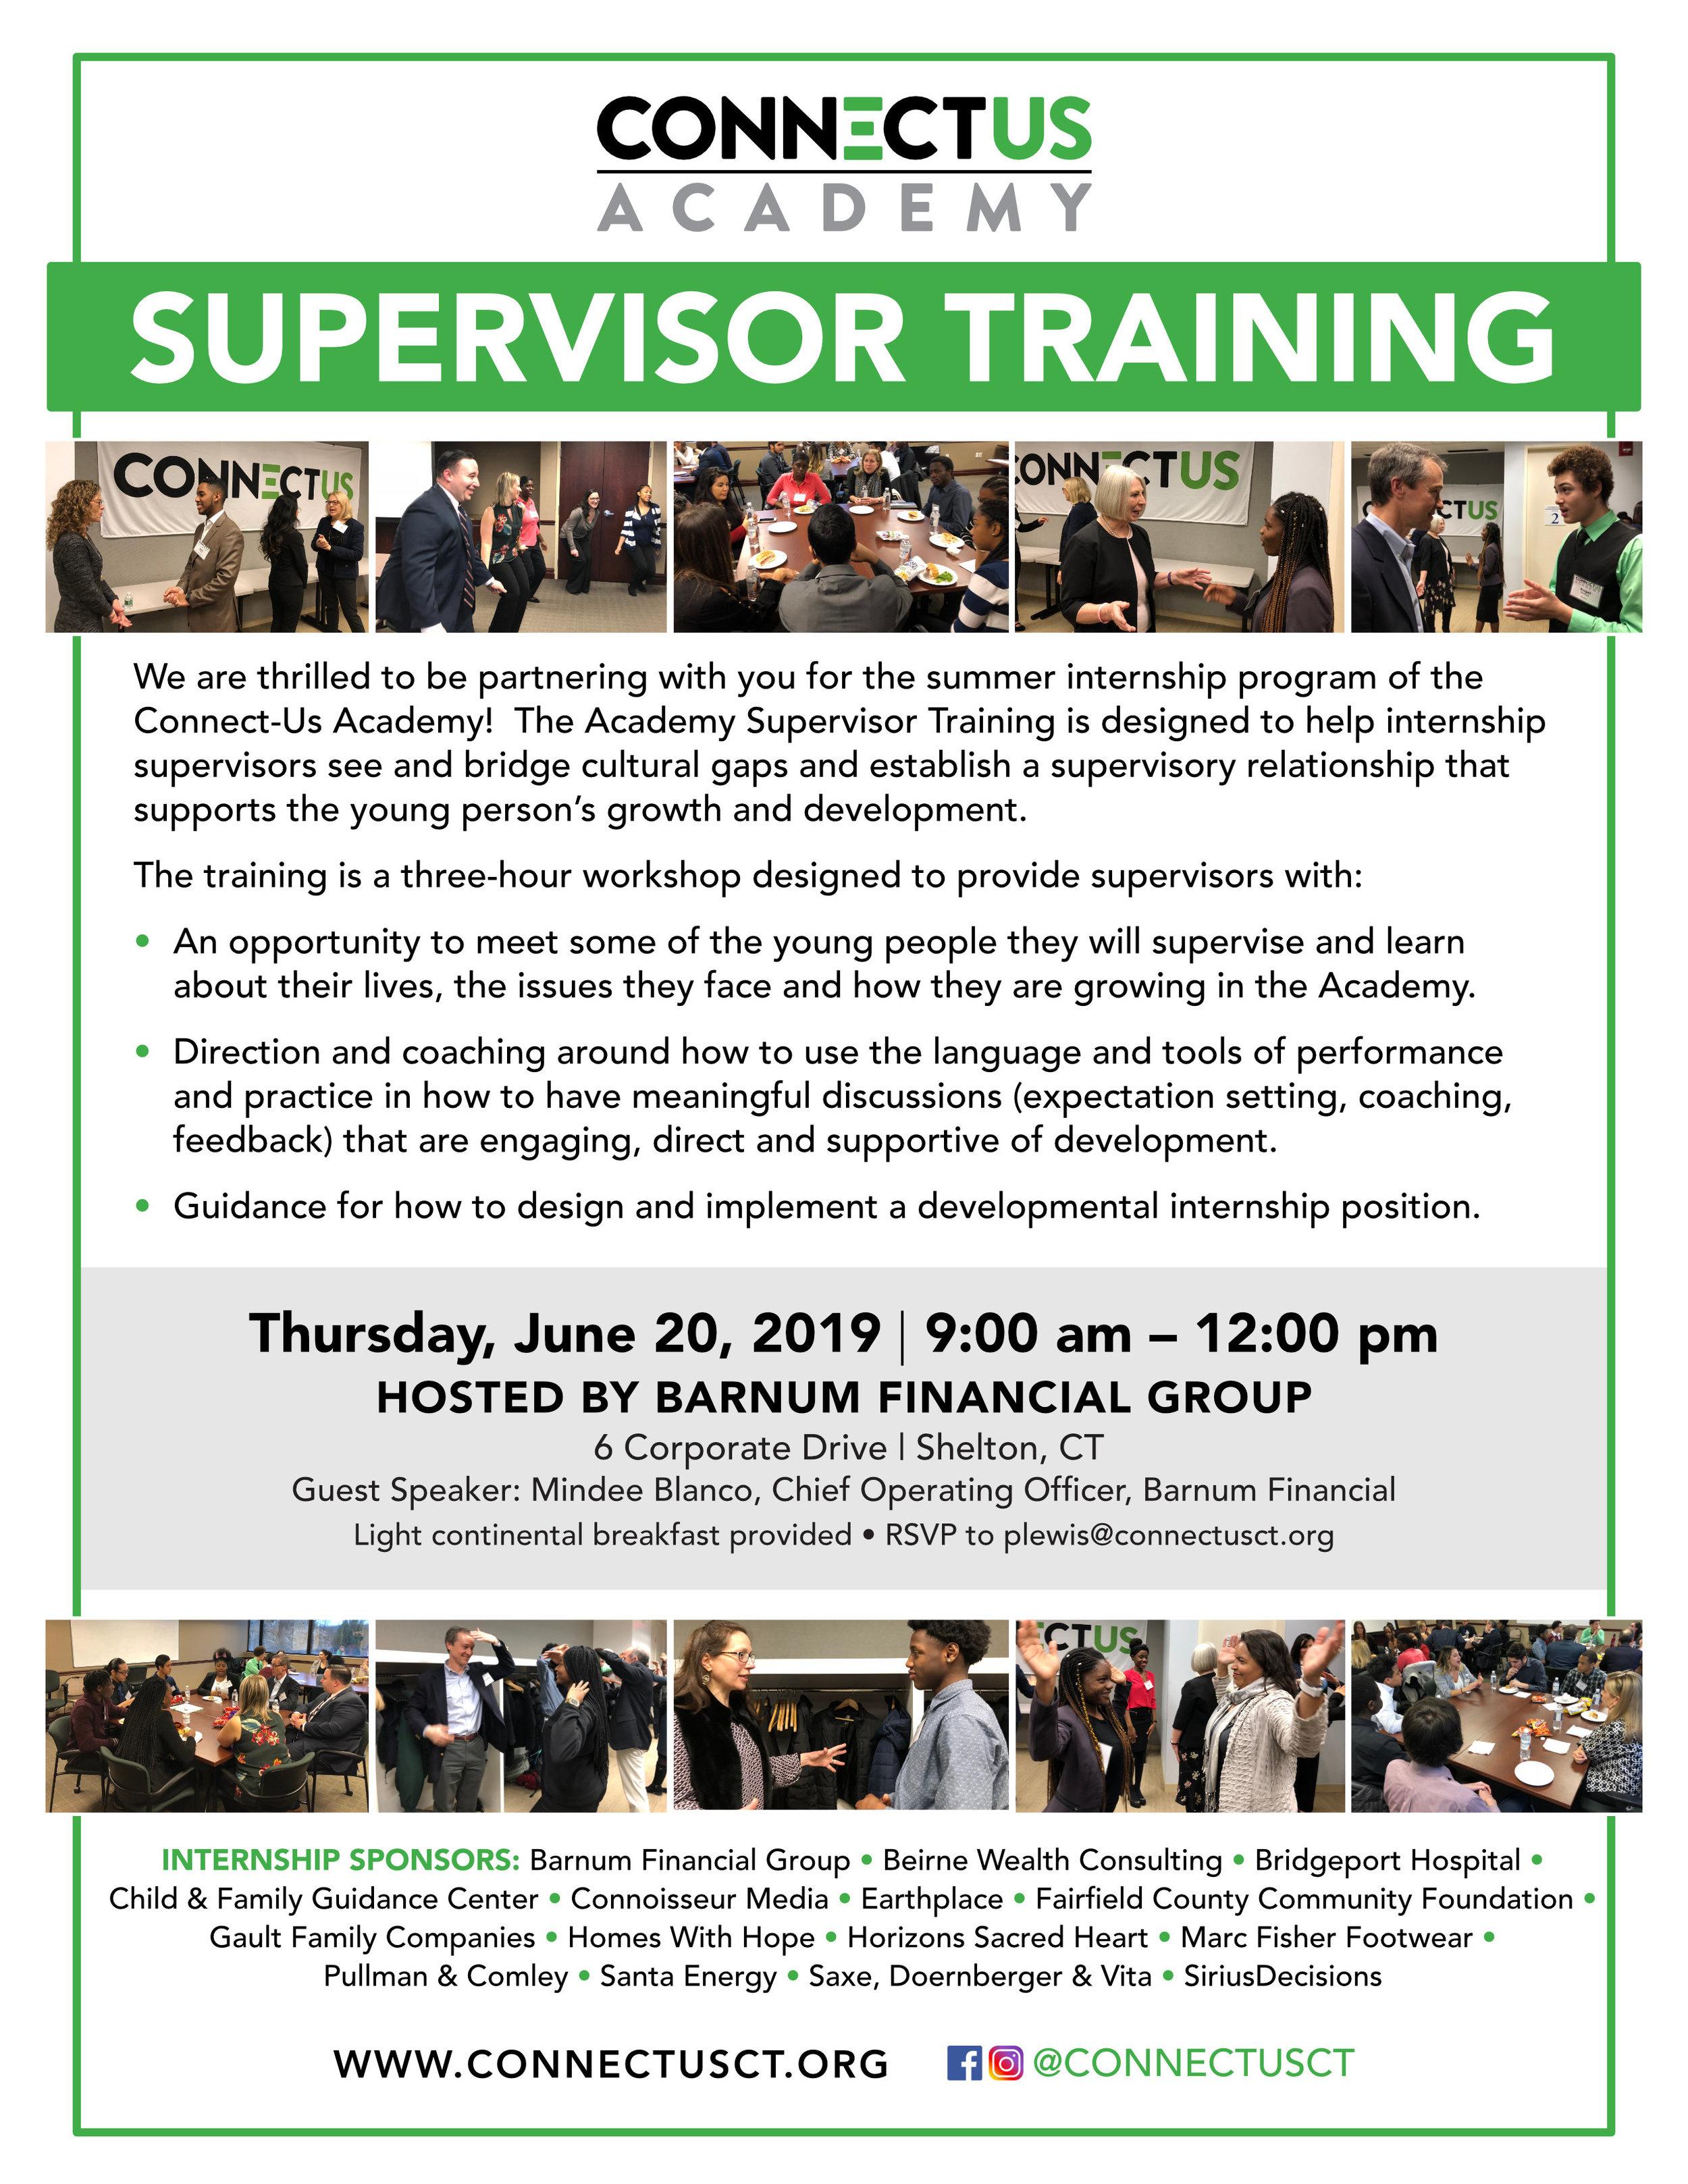 Supervisor Training Invitation - 2019.jpg